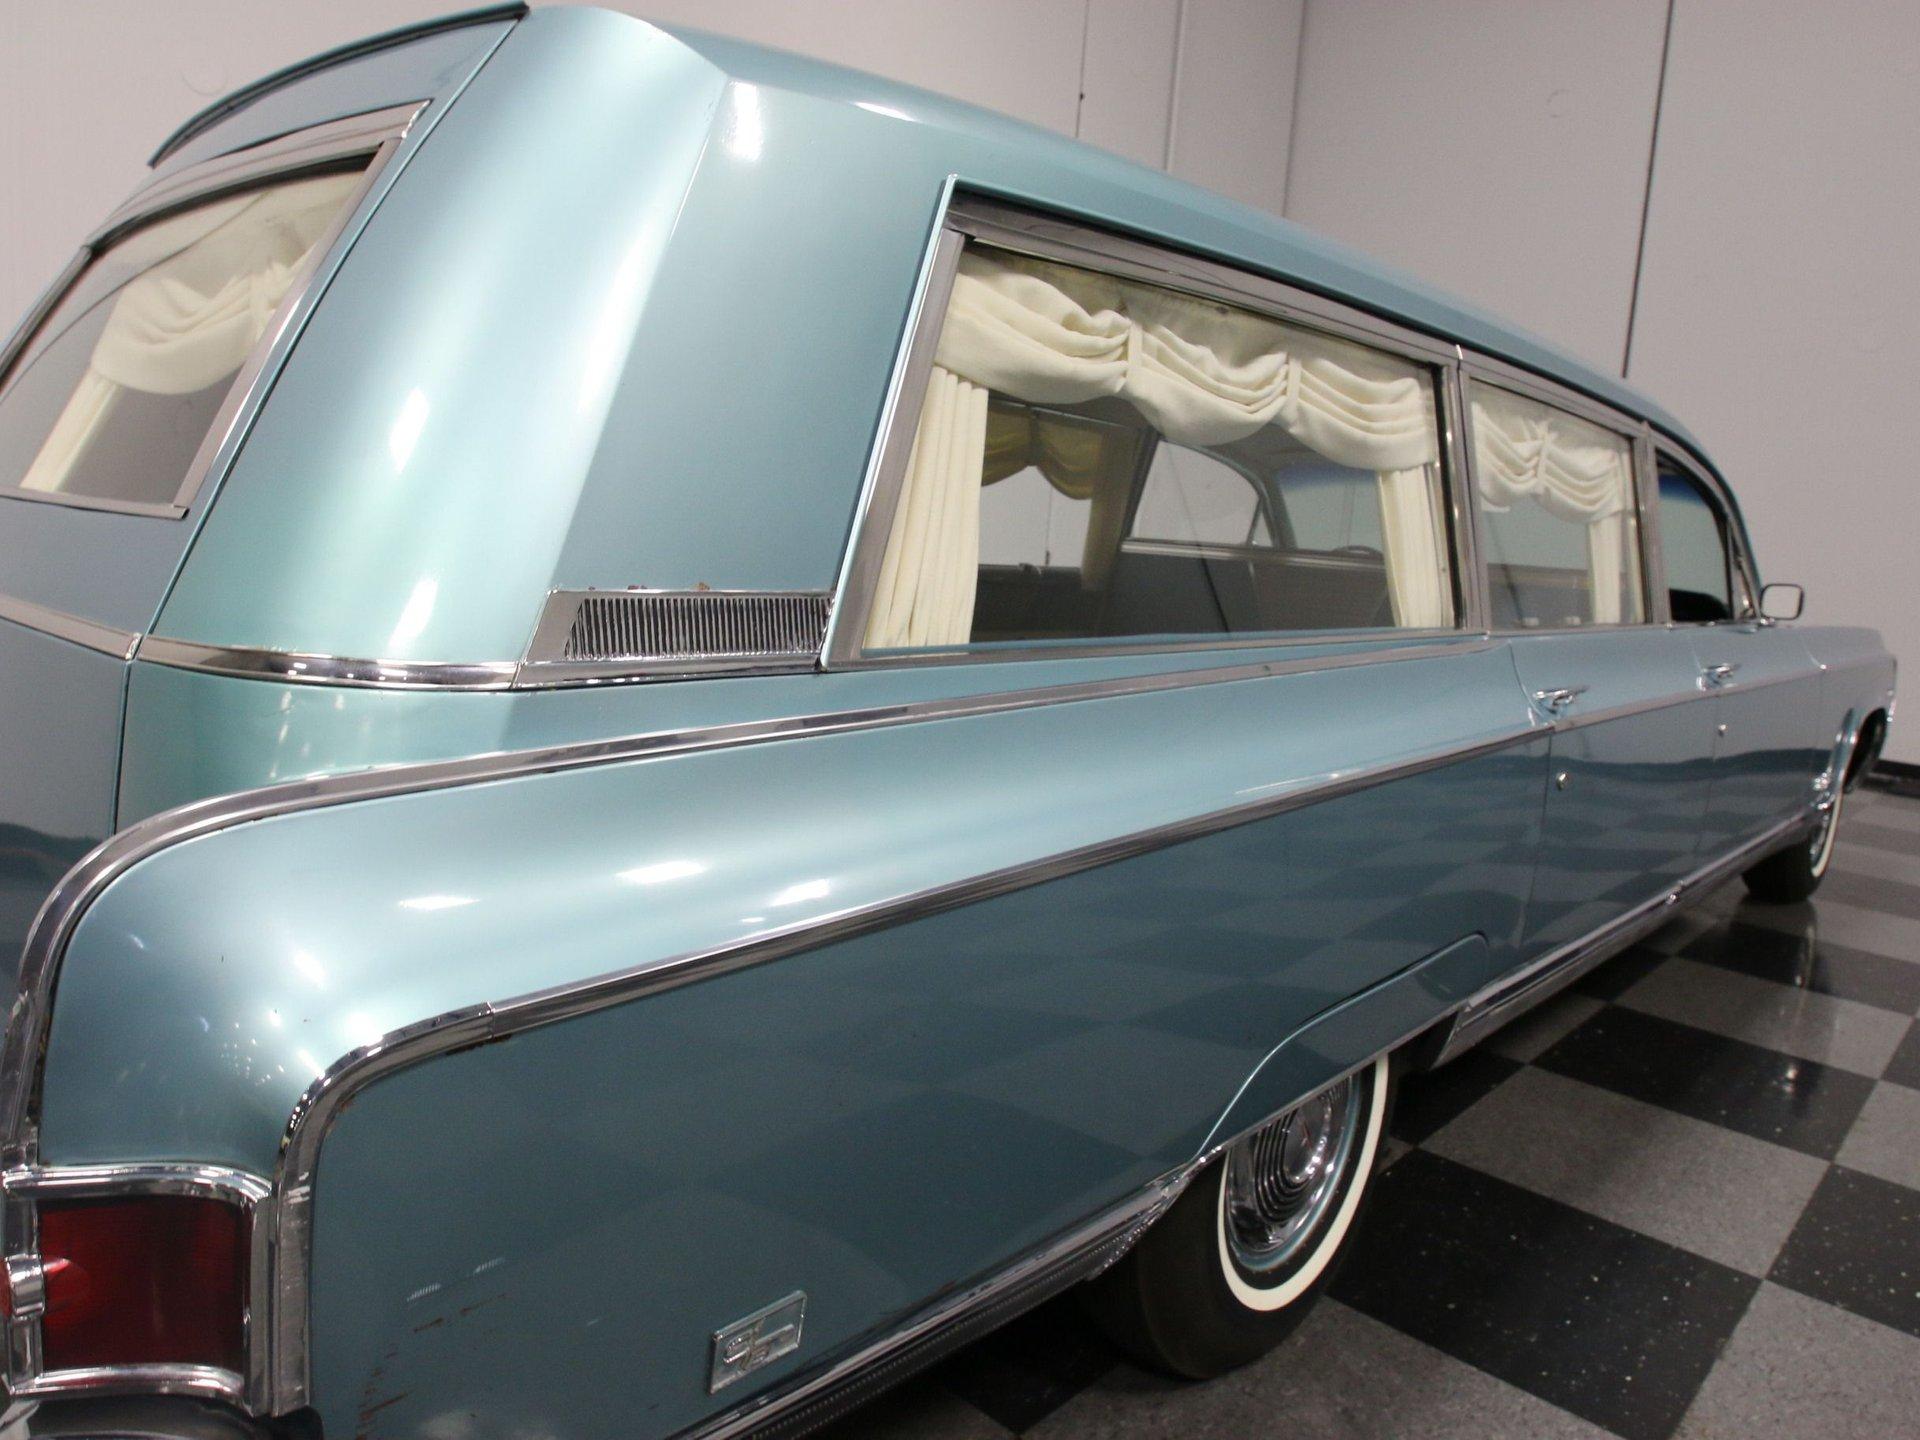 1964 Oldsmobile 98 | Streetside Classics - The Nation's